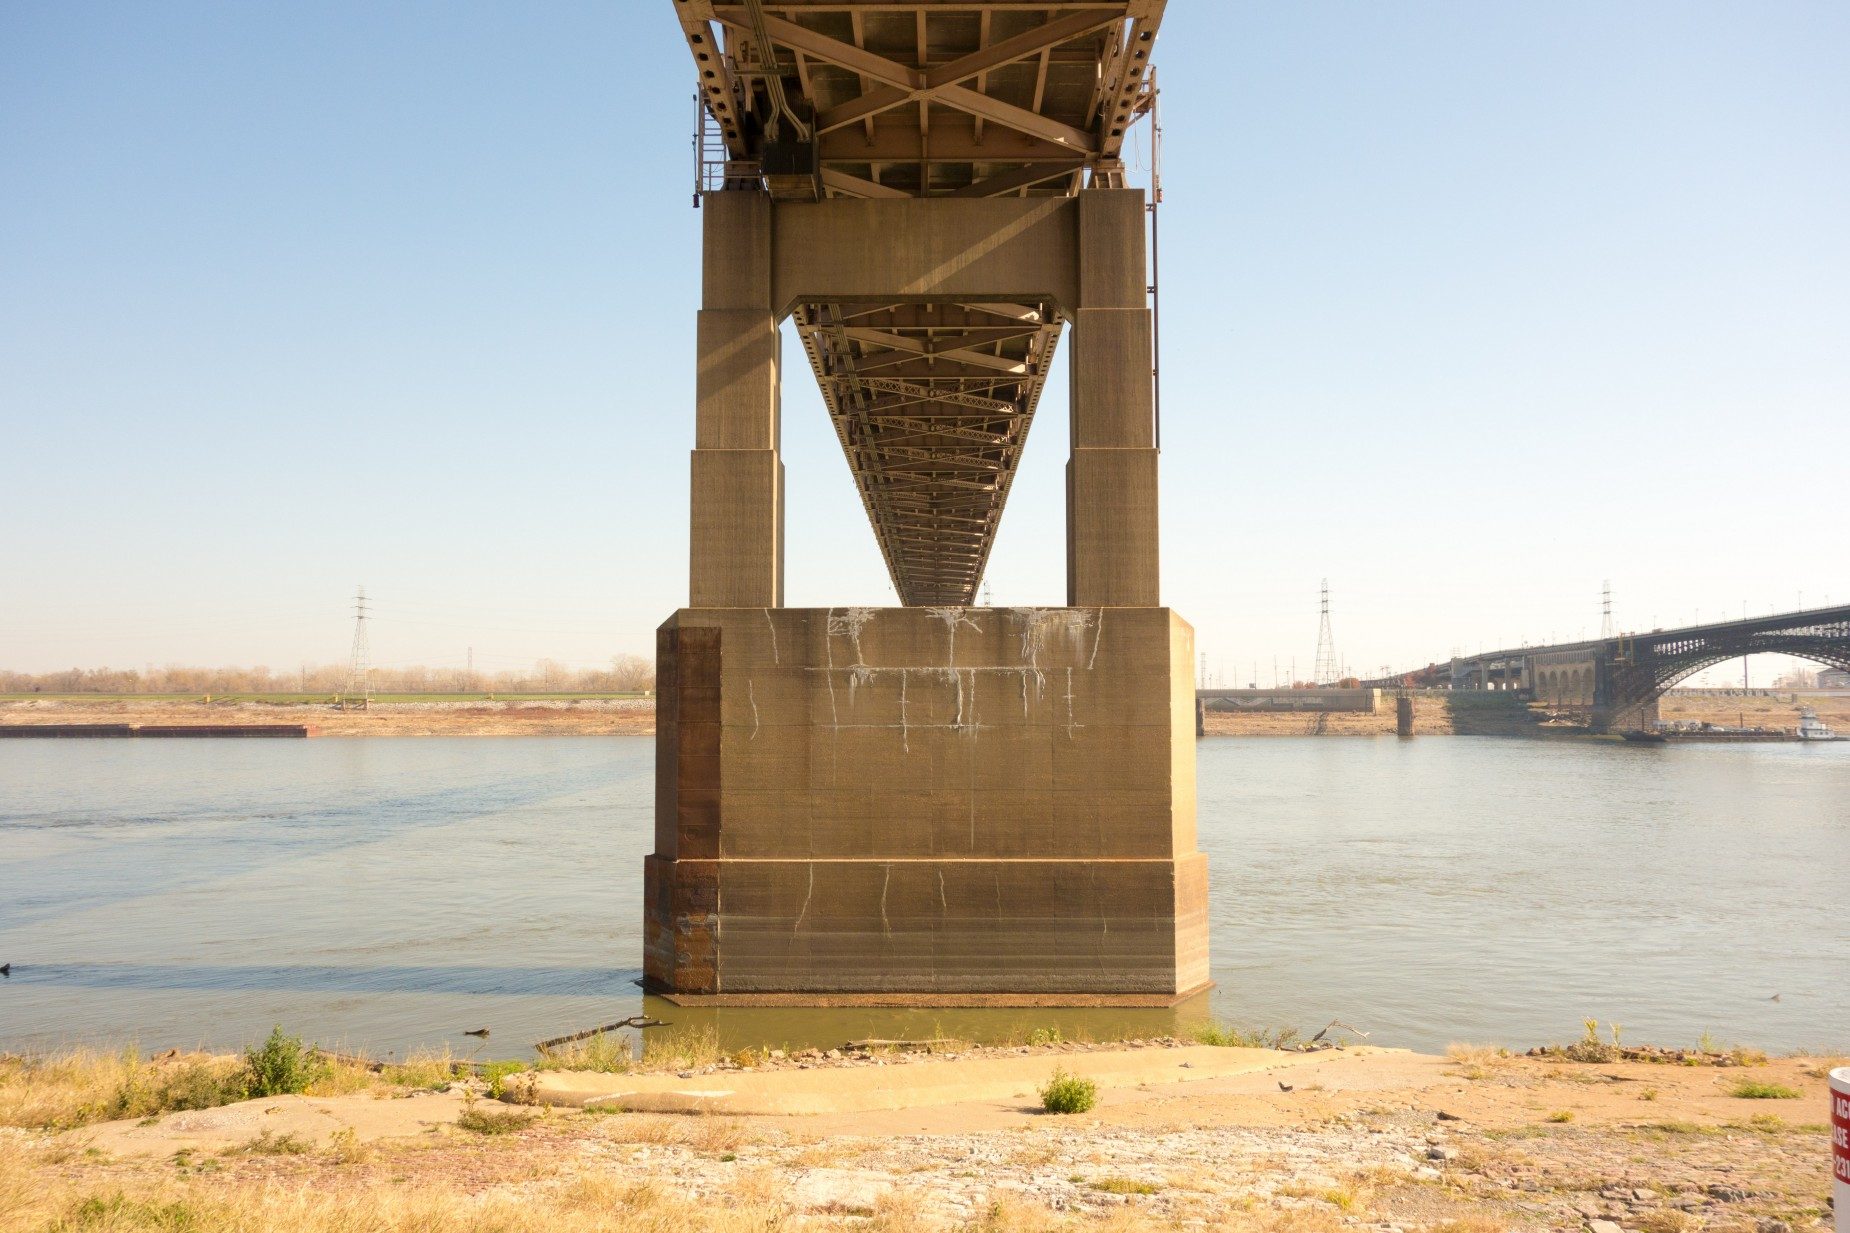 St-Louis-Bicycling-Riverview-Trail-13-1850x1233.jpg